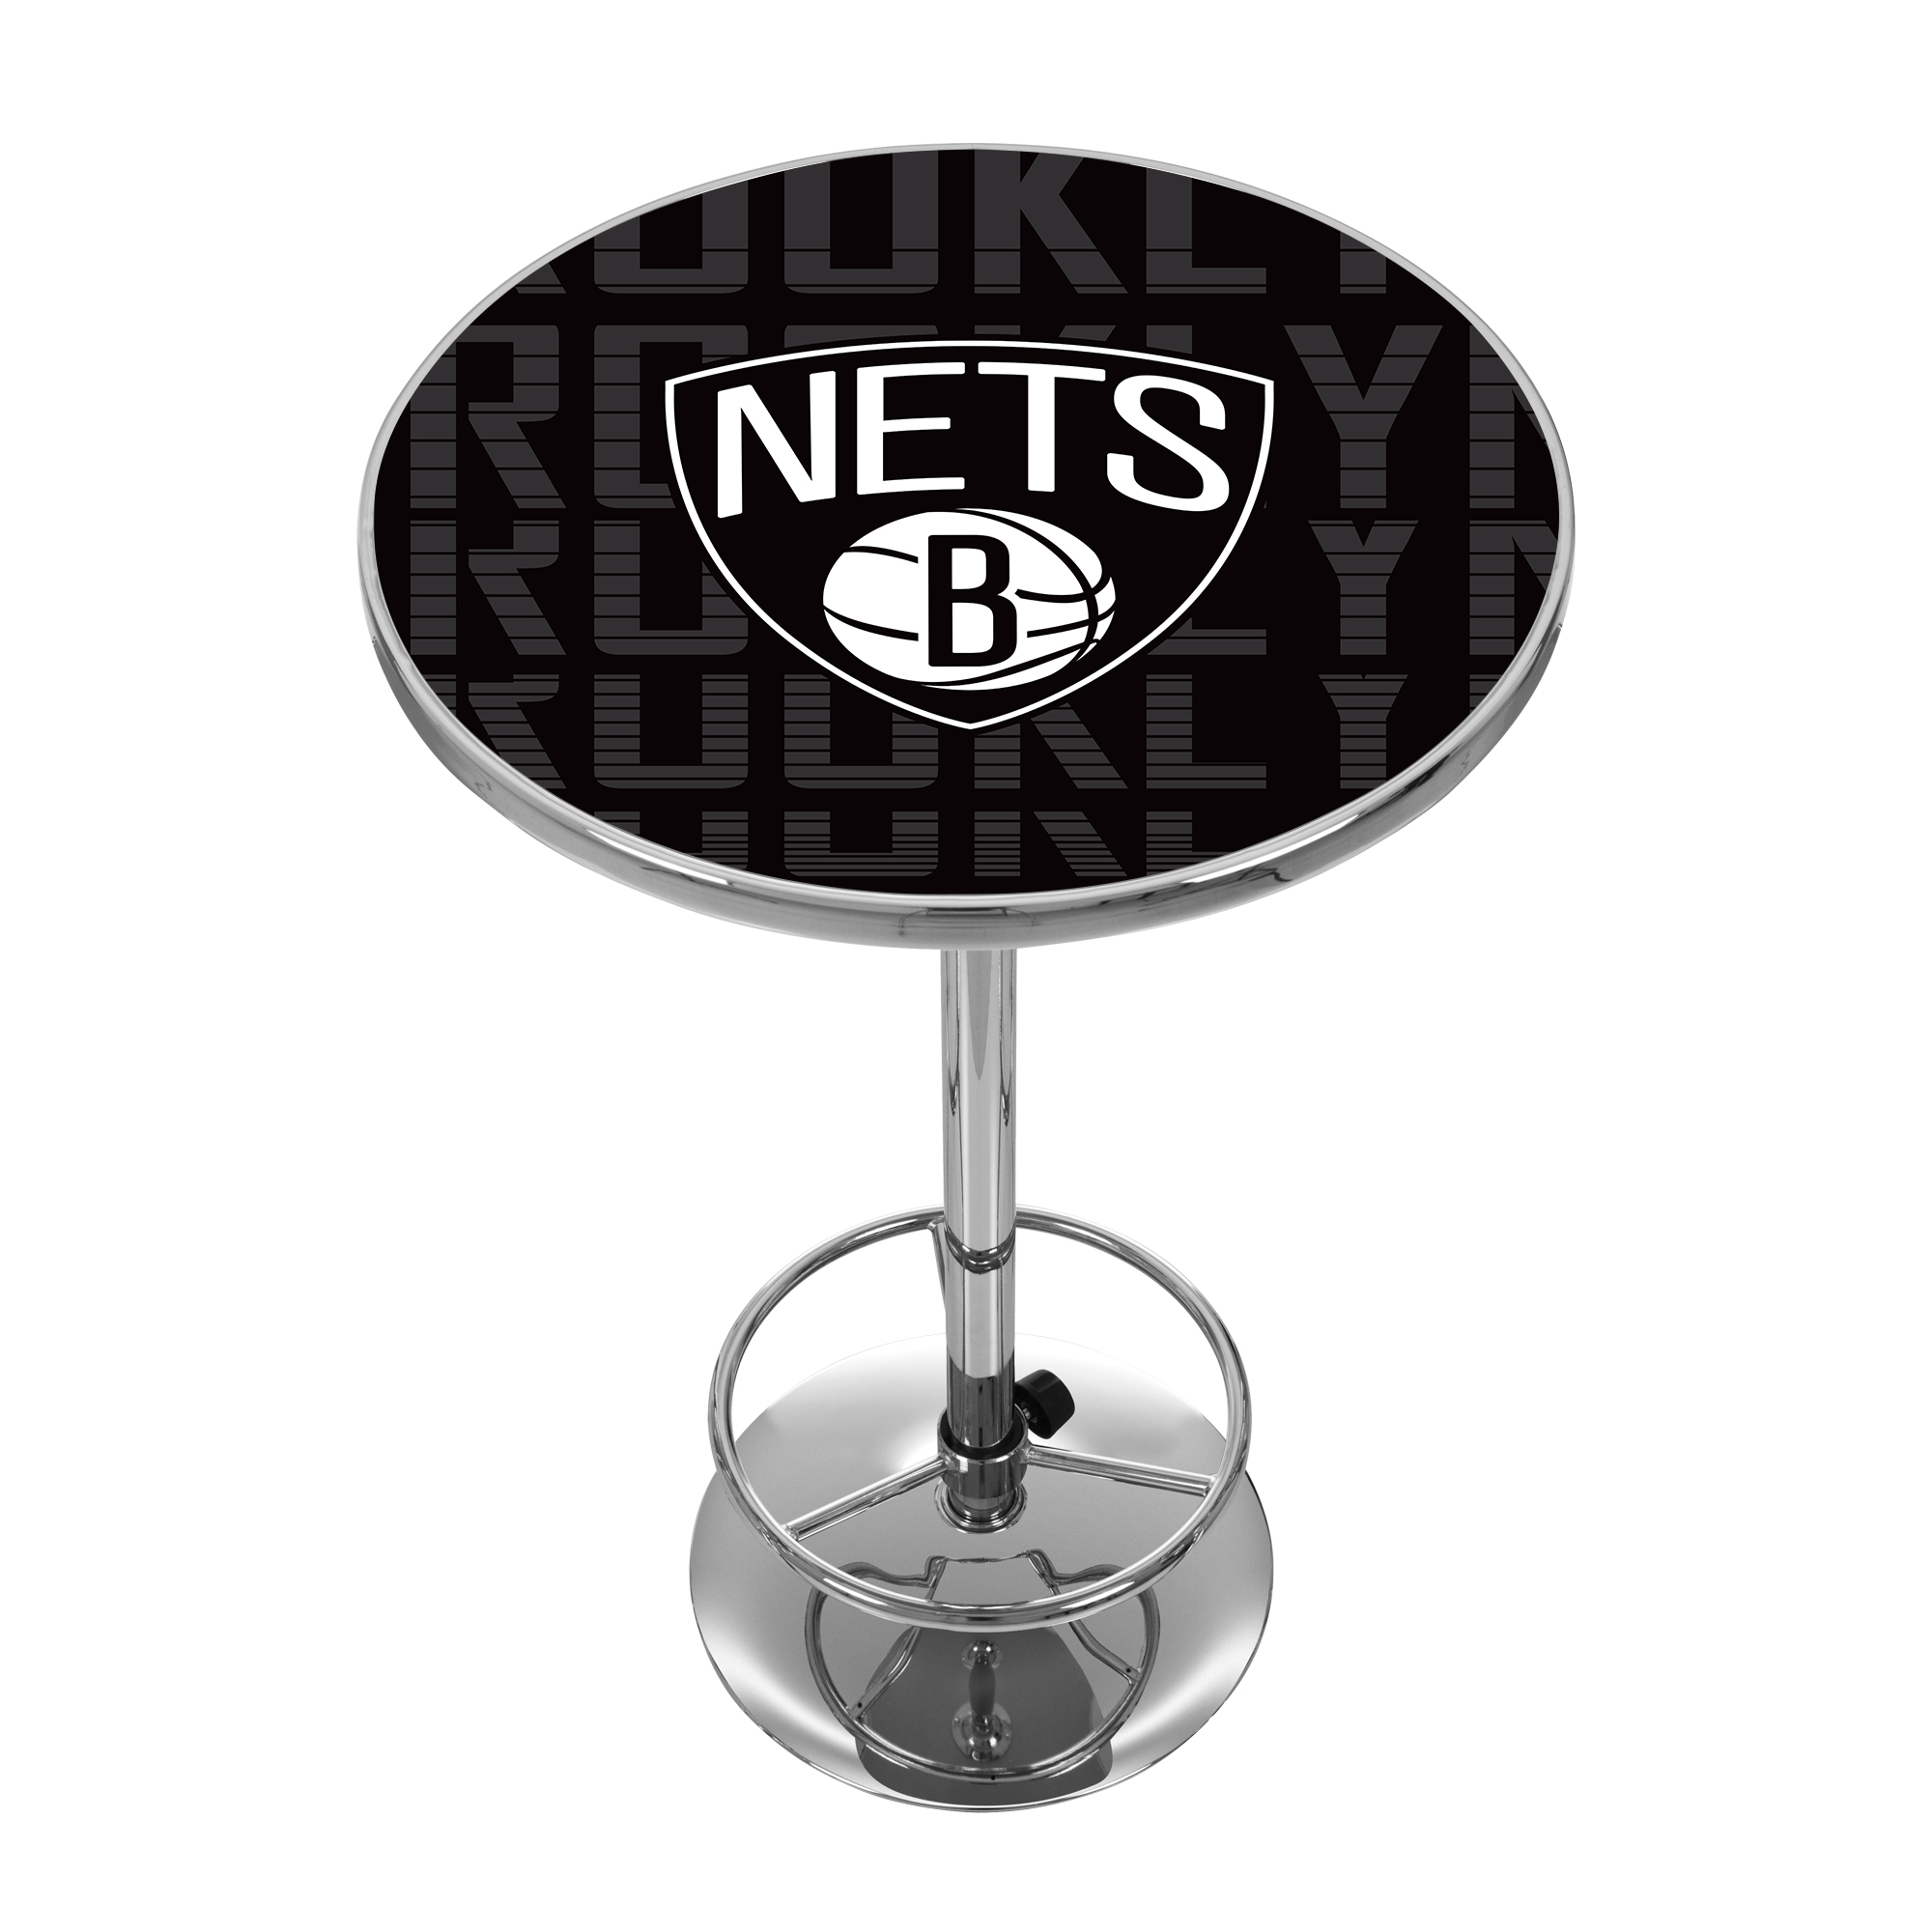 NBA Chrome Pub Table - City - Brooklyn Nets